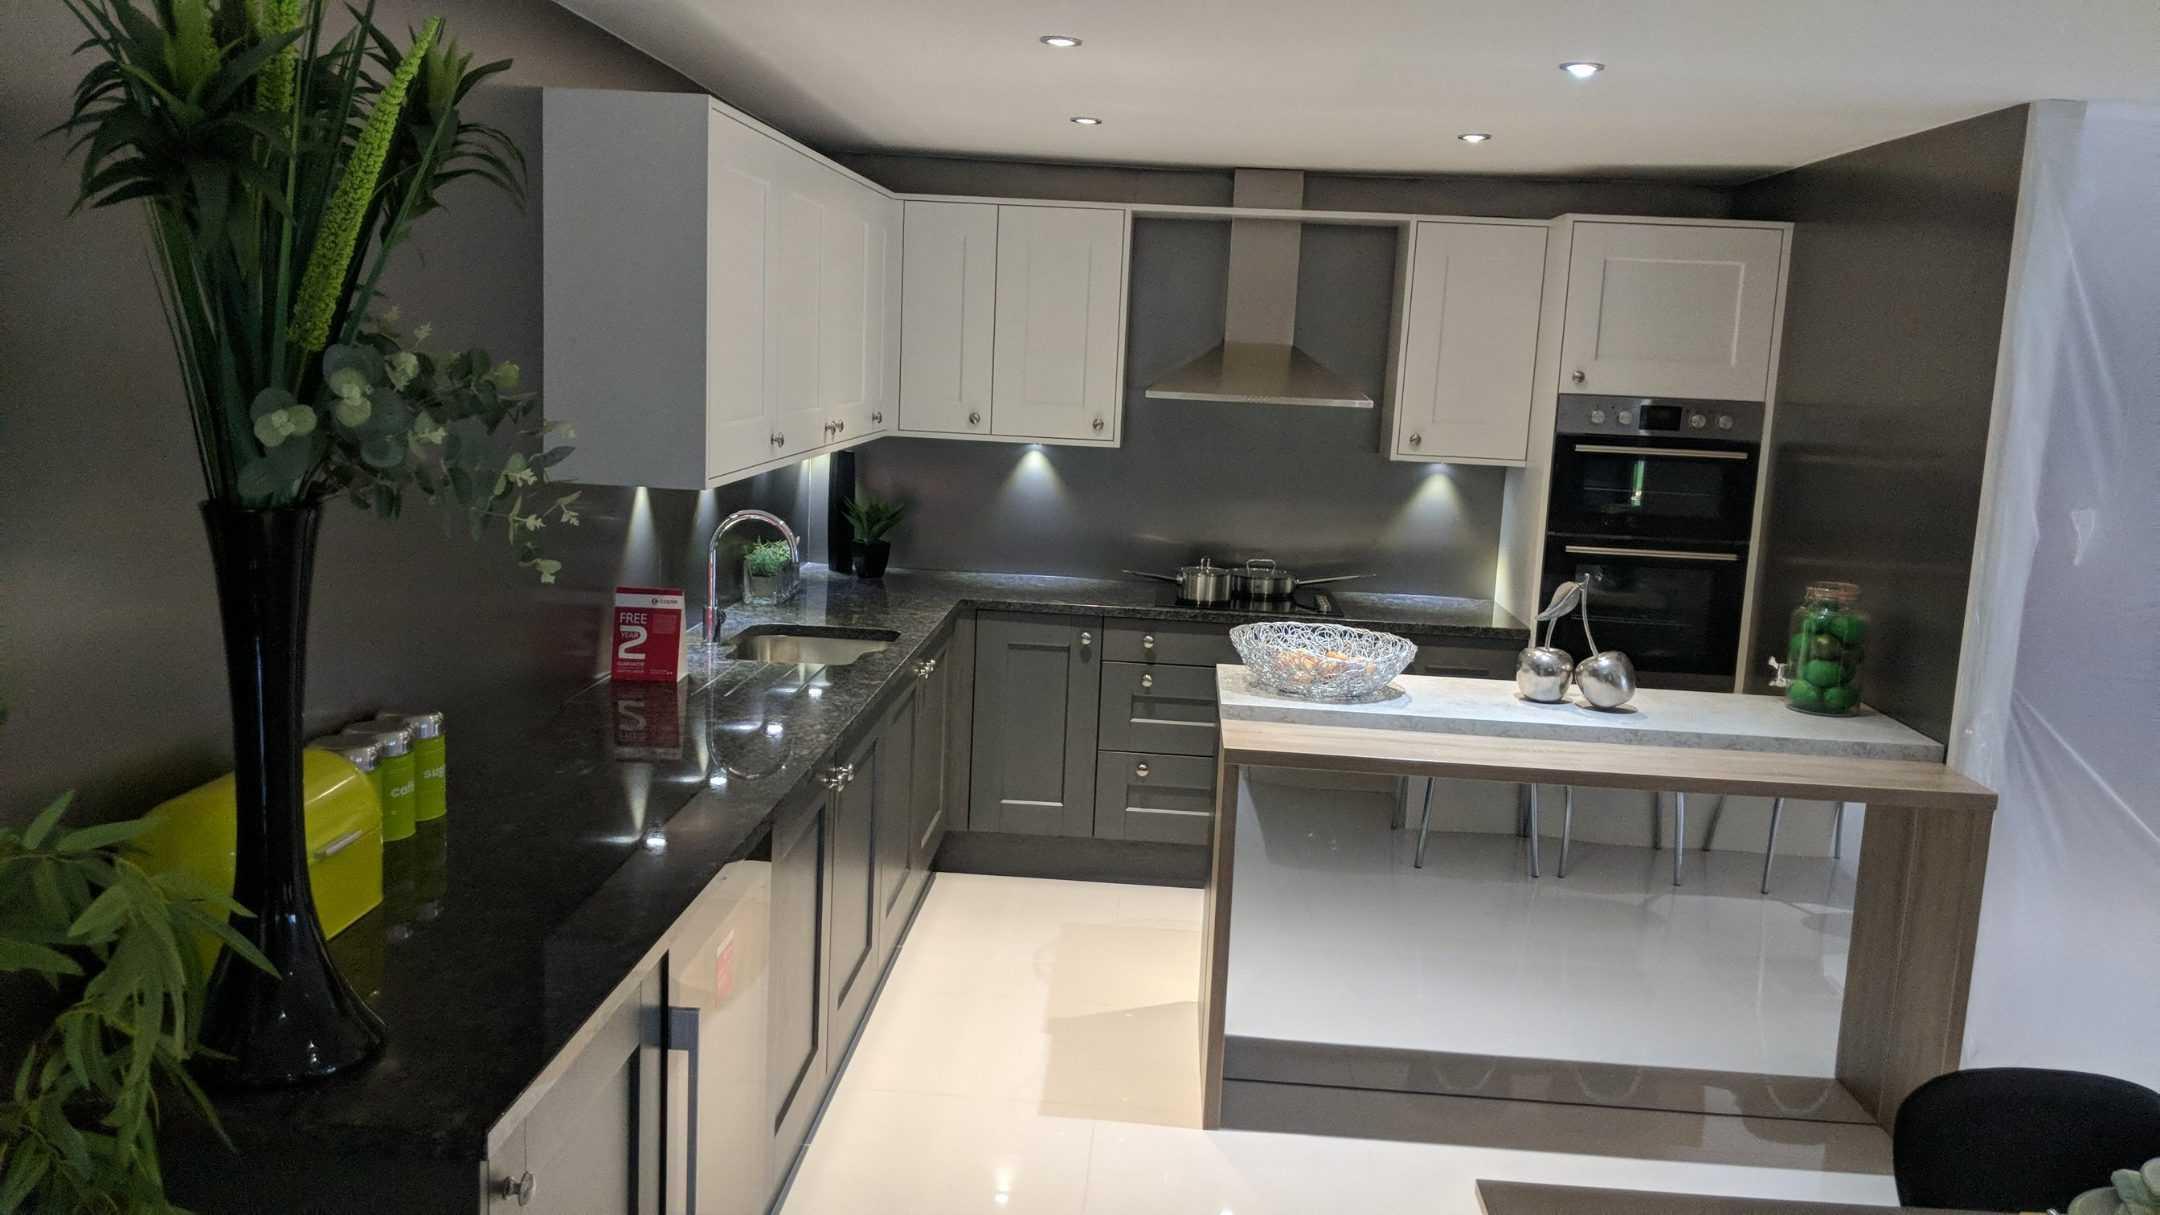 neon ex-display kitchen - Glasgow showroom